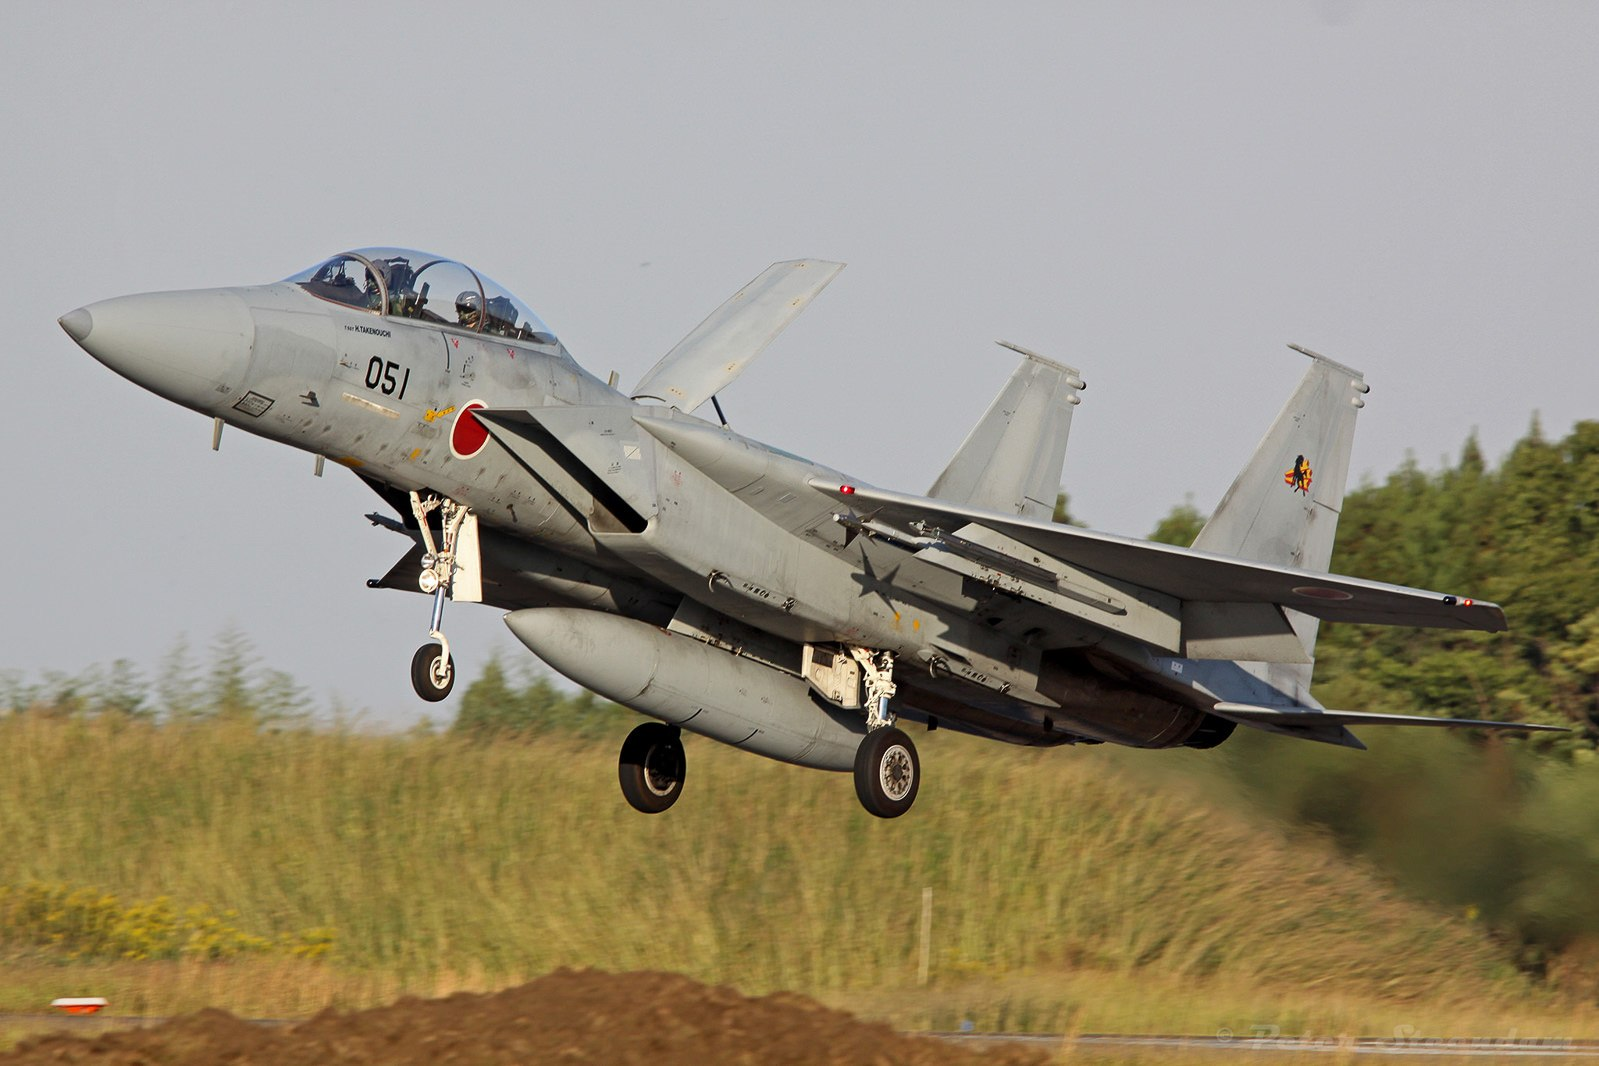 f-15dj-12-8051-23-tfs-landing_mod_fb